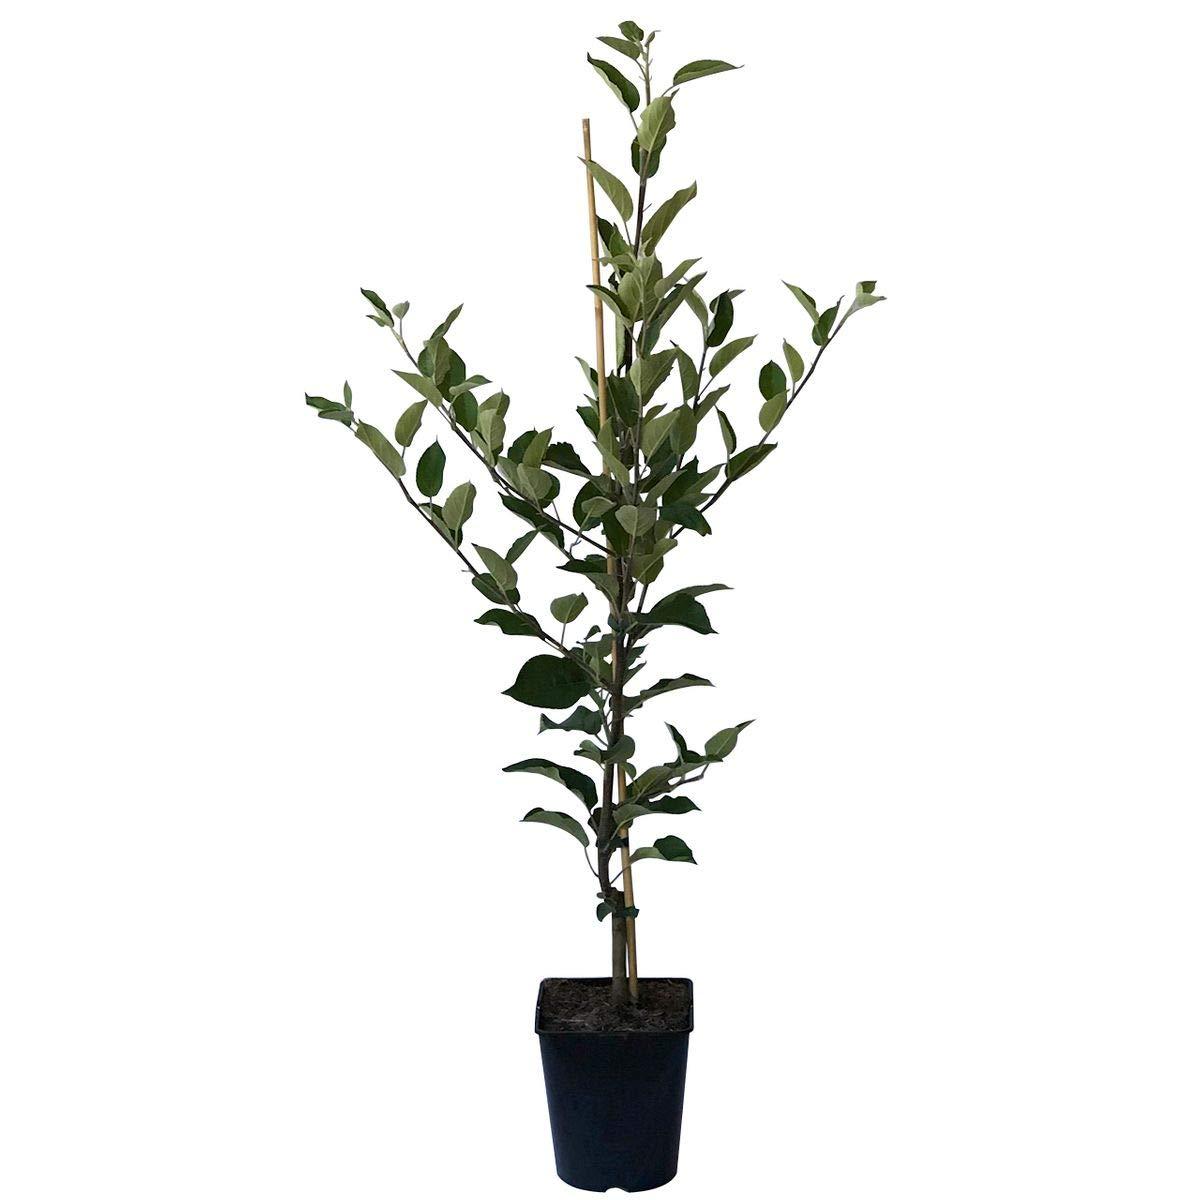 Apfelbaum Granny Smith Compact Spindelbaum 100-120 cm im 5 Liter Topf  M9